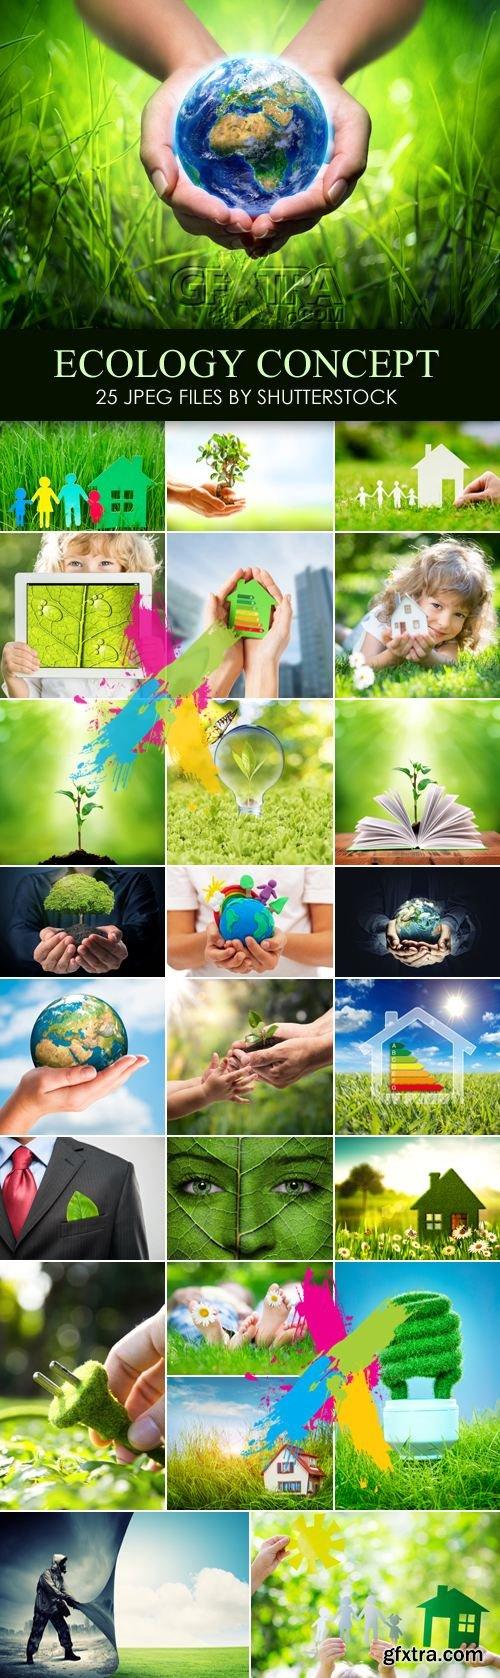 Stock Photo - Ecology Concept, Green Earth